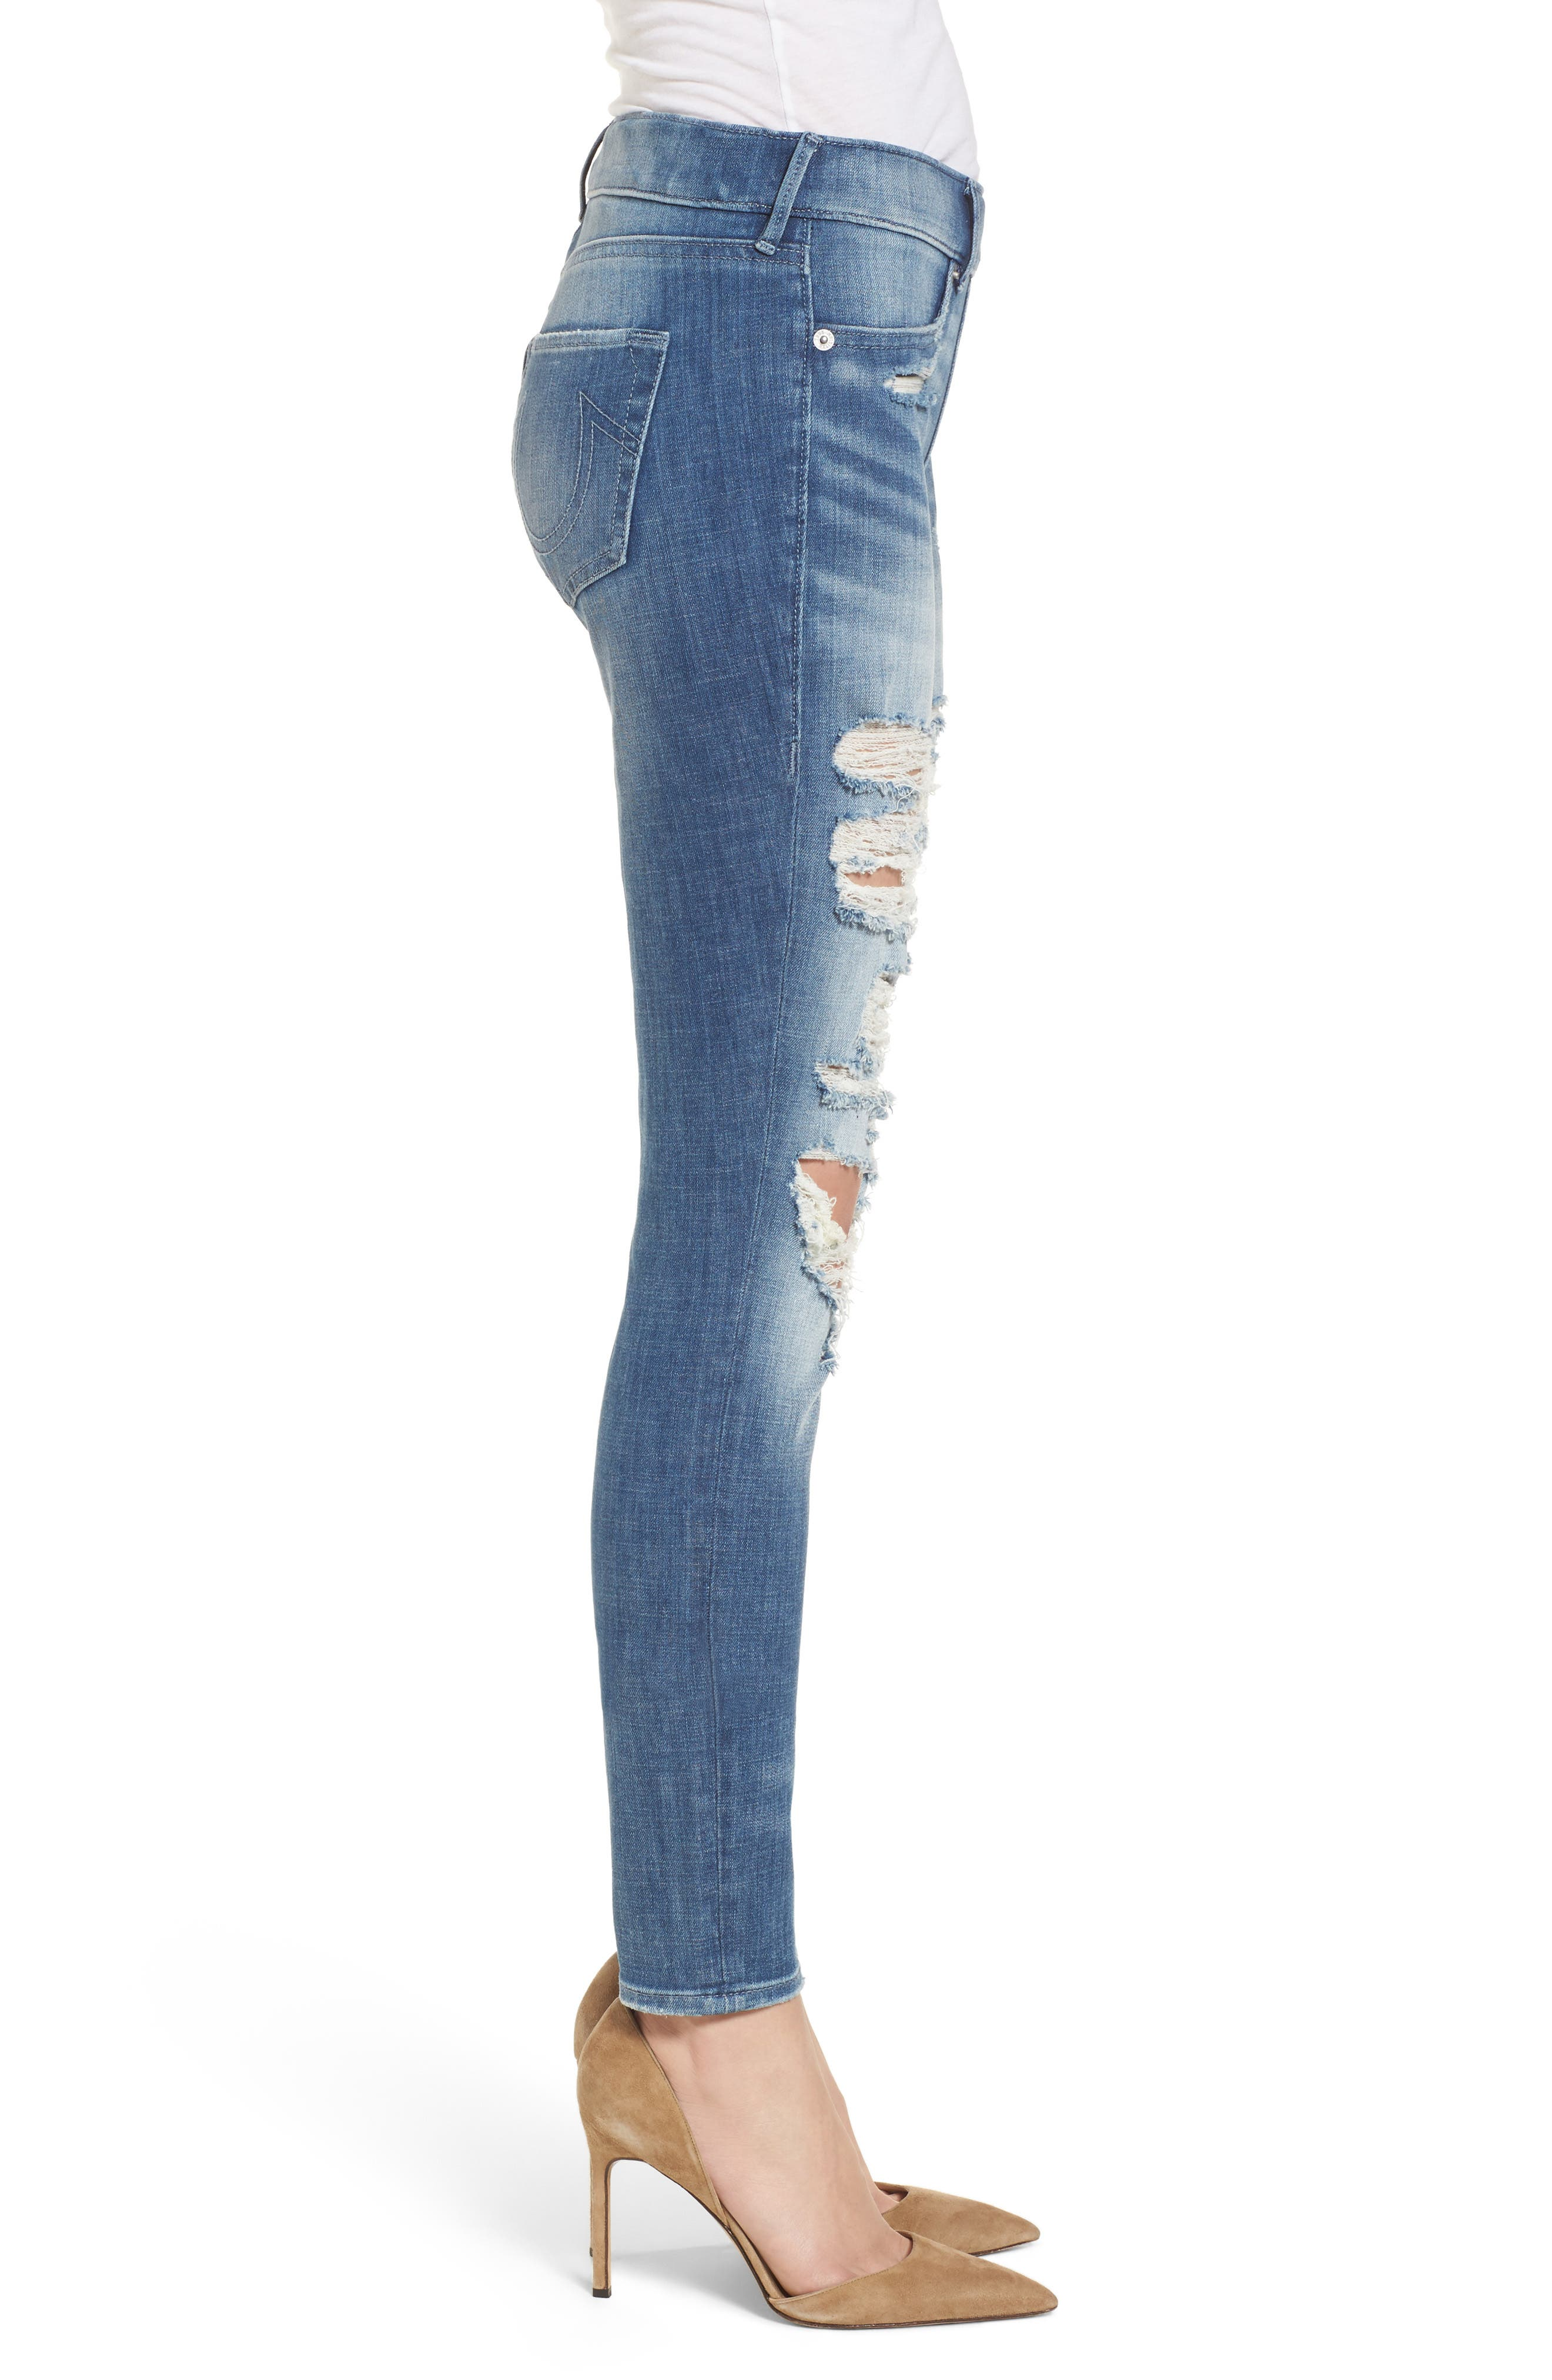 Jennie Runaway Legging Jeans,                             Alternate thumbnail 3, color,                             401